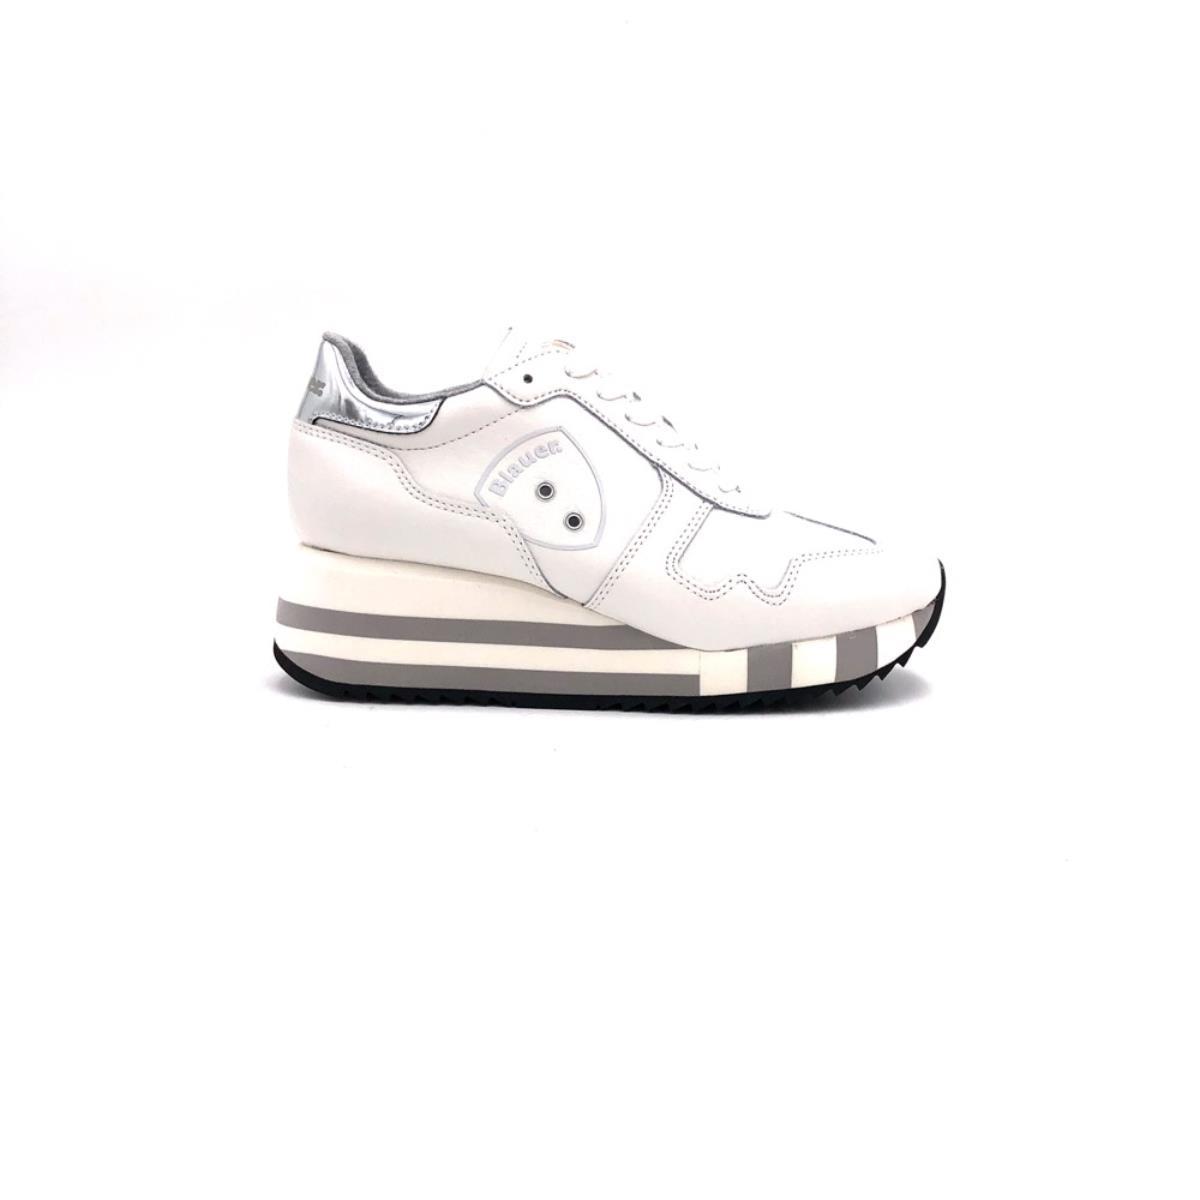 lea Sneakers 9scharlotte01 Blauer Blauer Shoes CordQWxBe